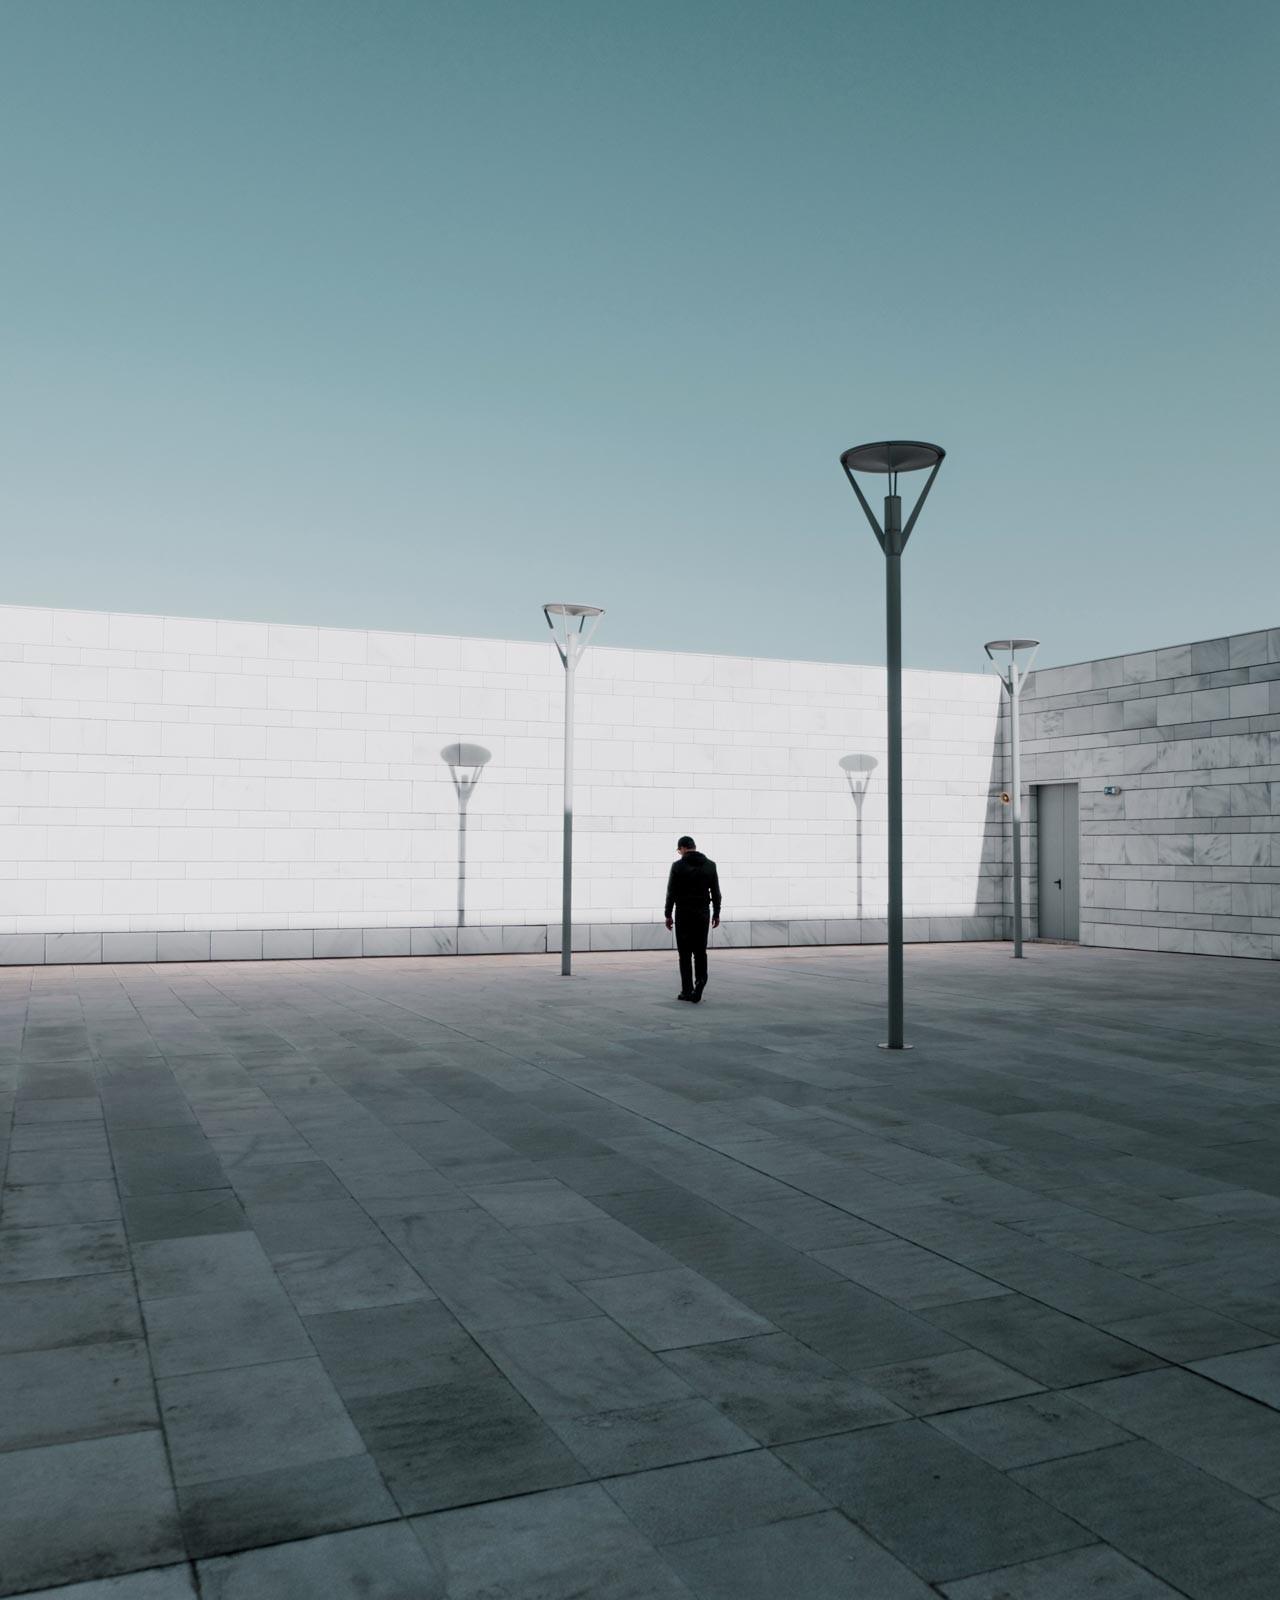 Категория «Приверженец минимализма». Салоники, Греция. Автор Димитрис Михайлидис